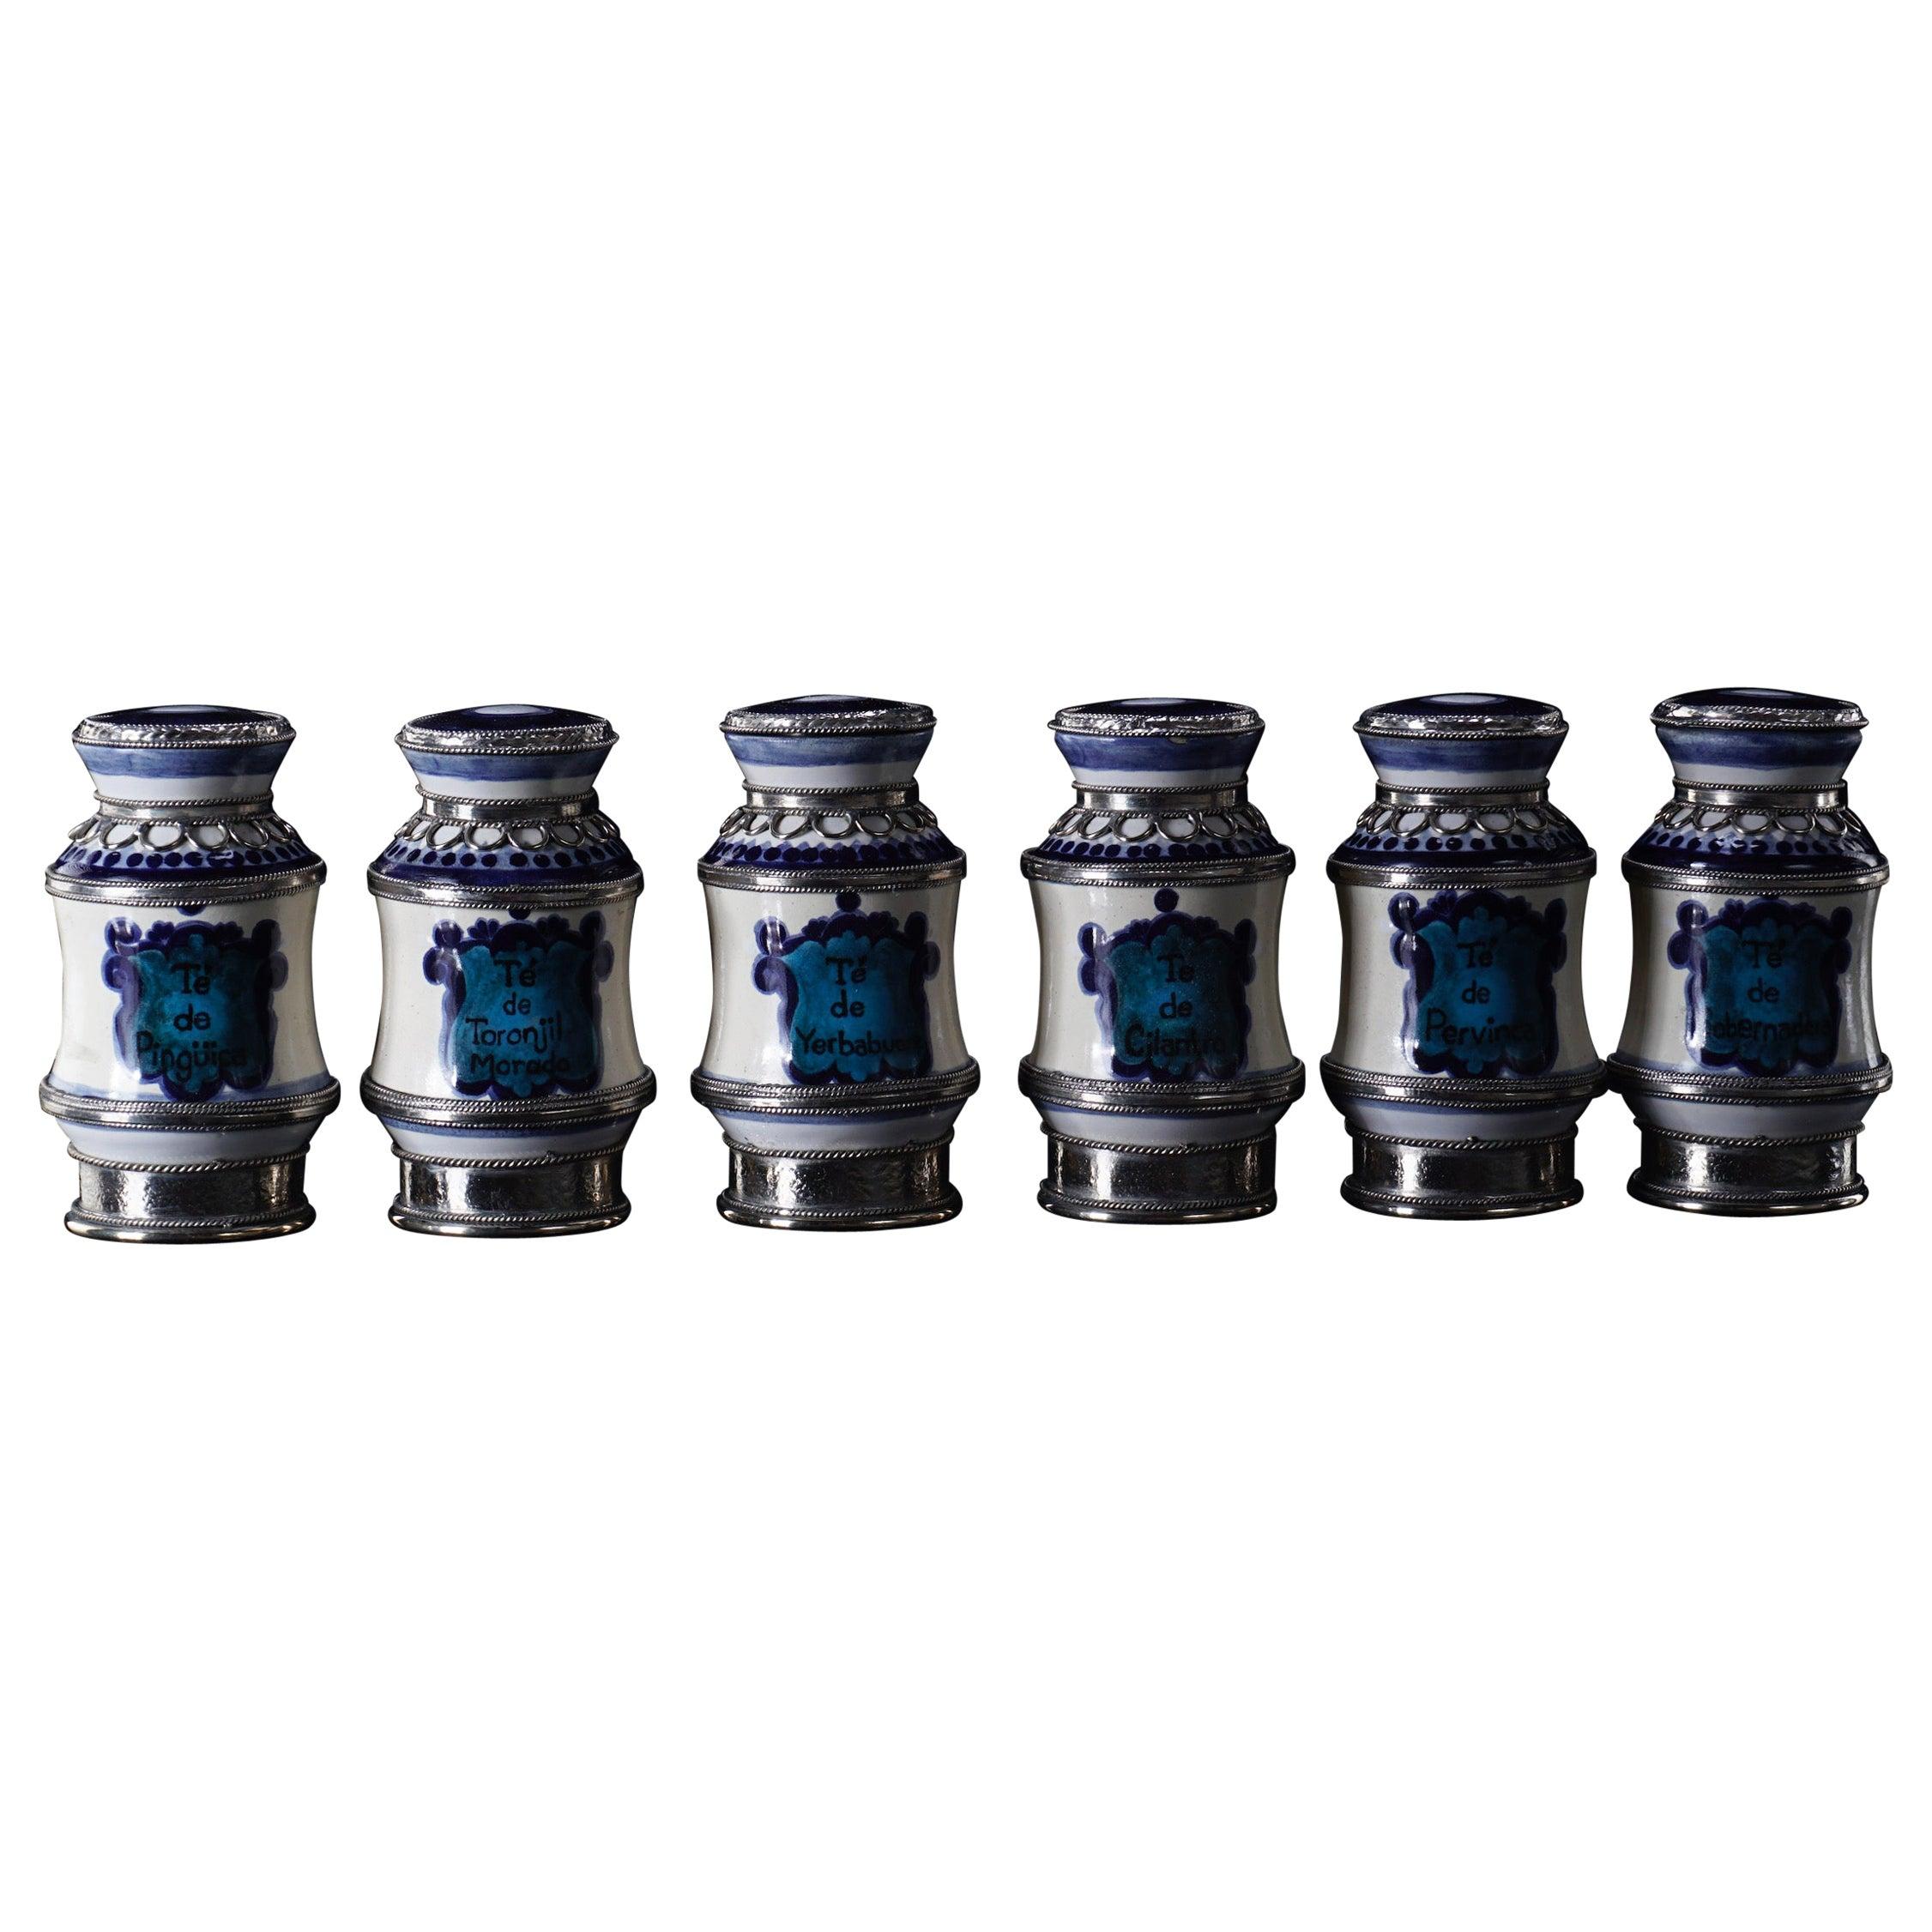 Ceramic and White Metal 'Alpaca' Set of 6 Pharmacy Jars